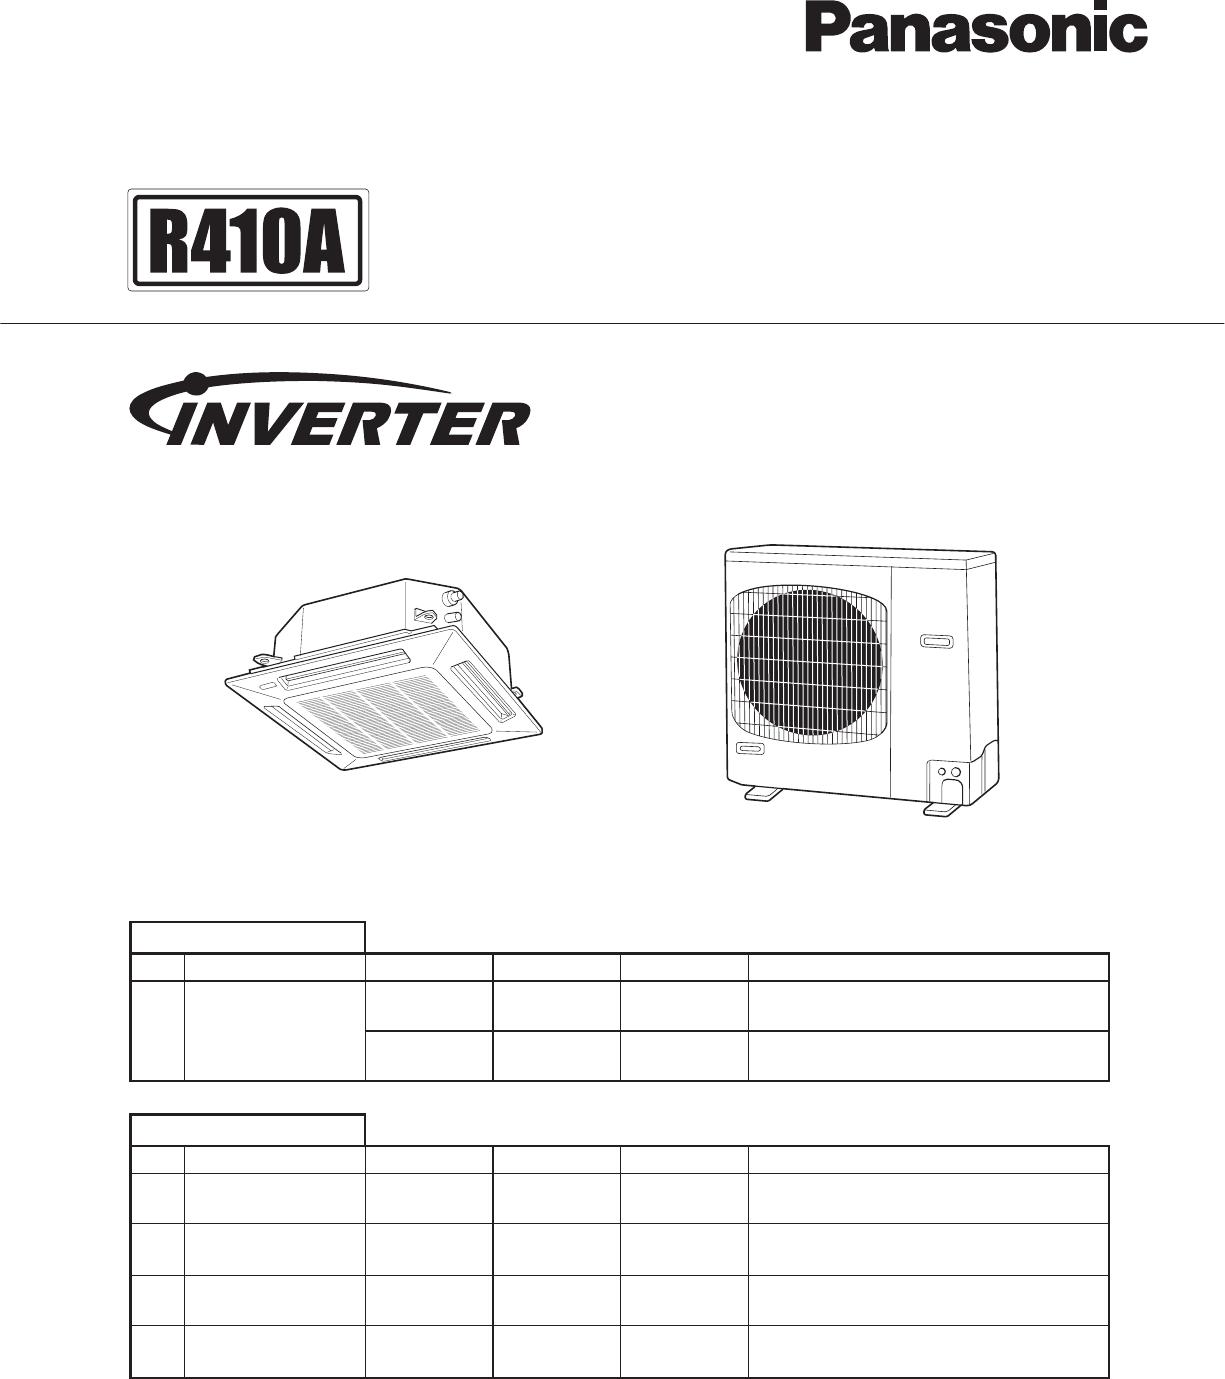 panasonic air conditioner cz-rtc2 manual